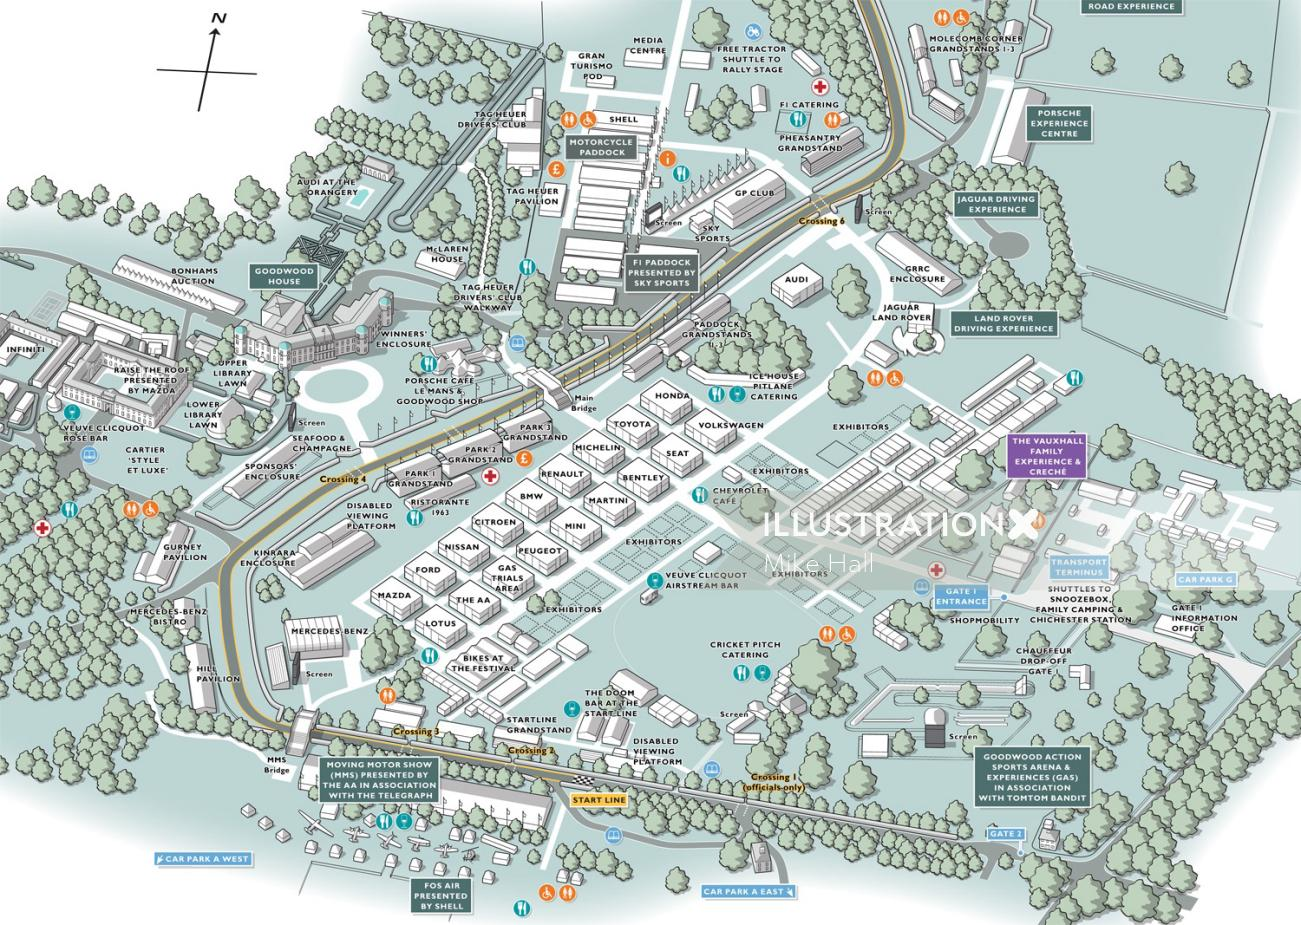 Goodwood Festival of Speed event map illustration